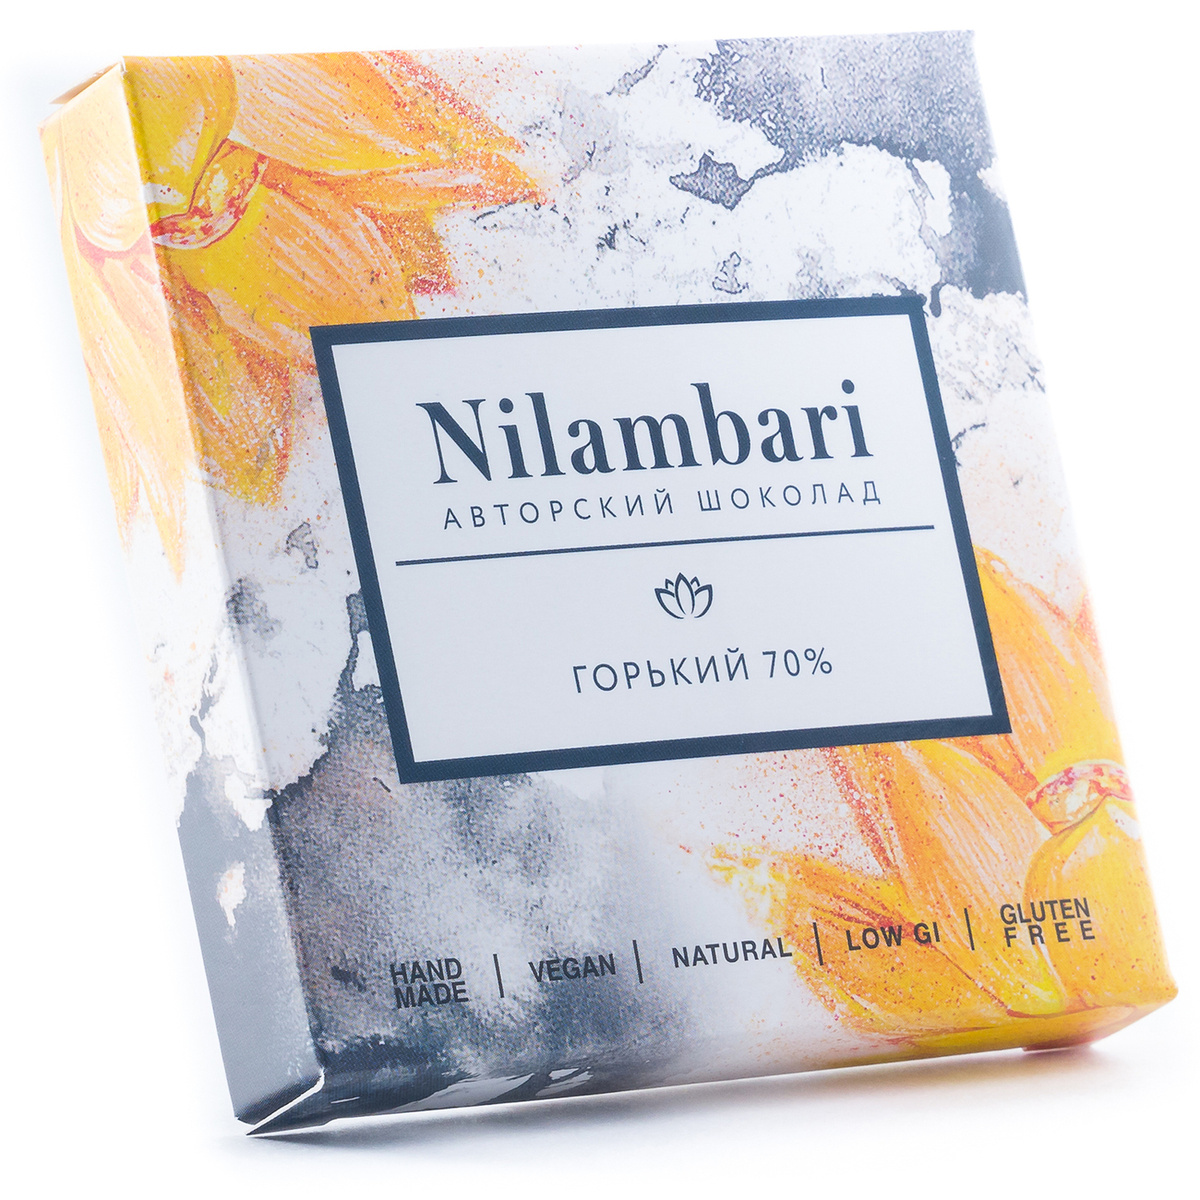 Шоколад Nilambari горький 70% / GreenMania #1